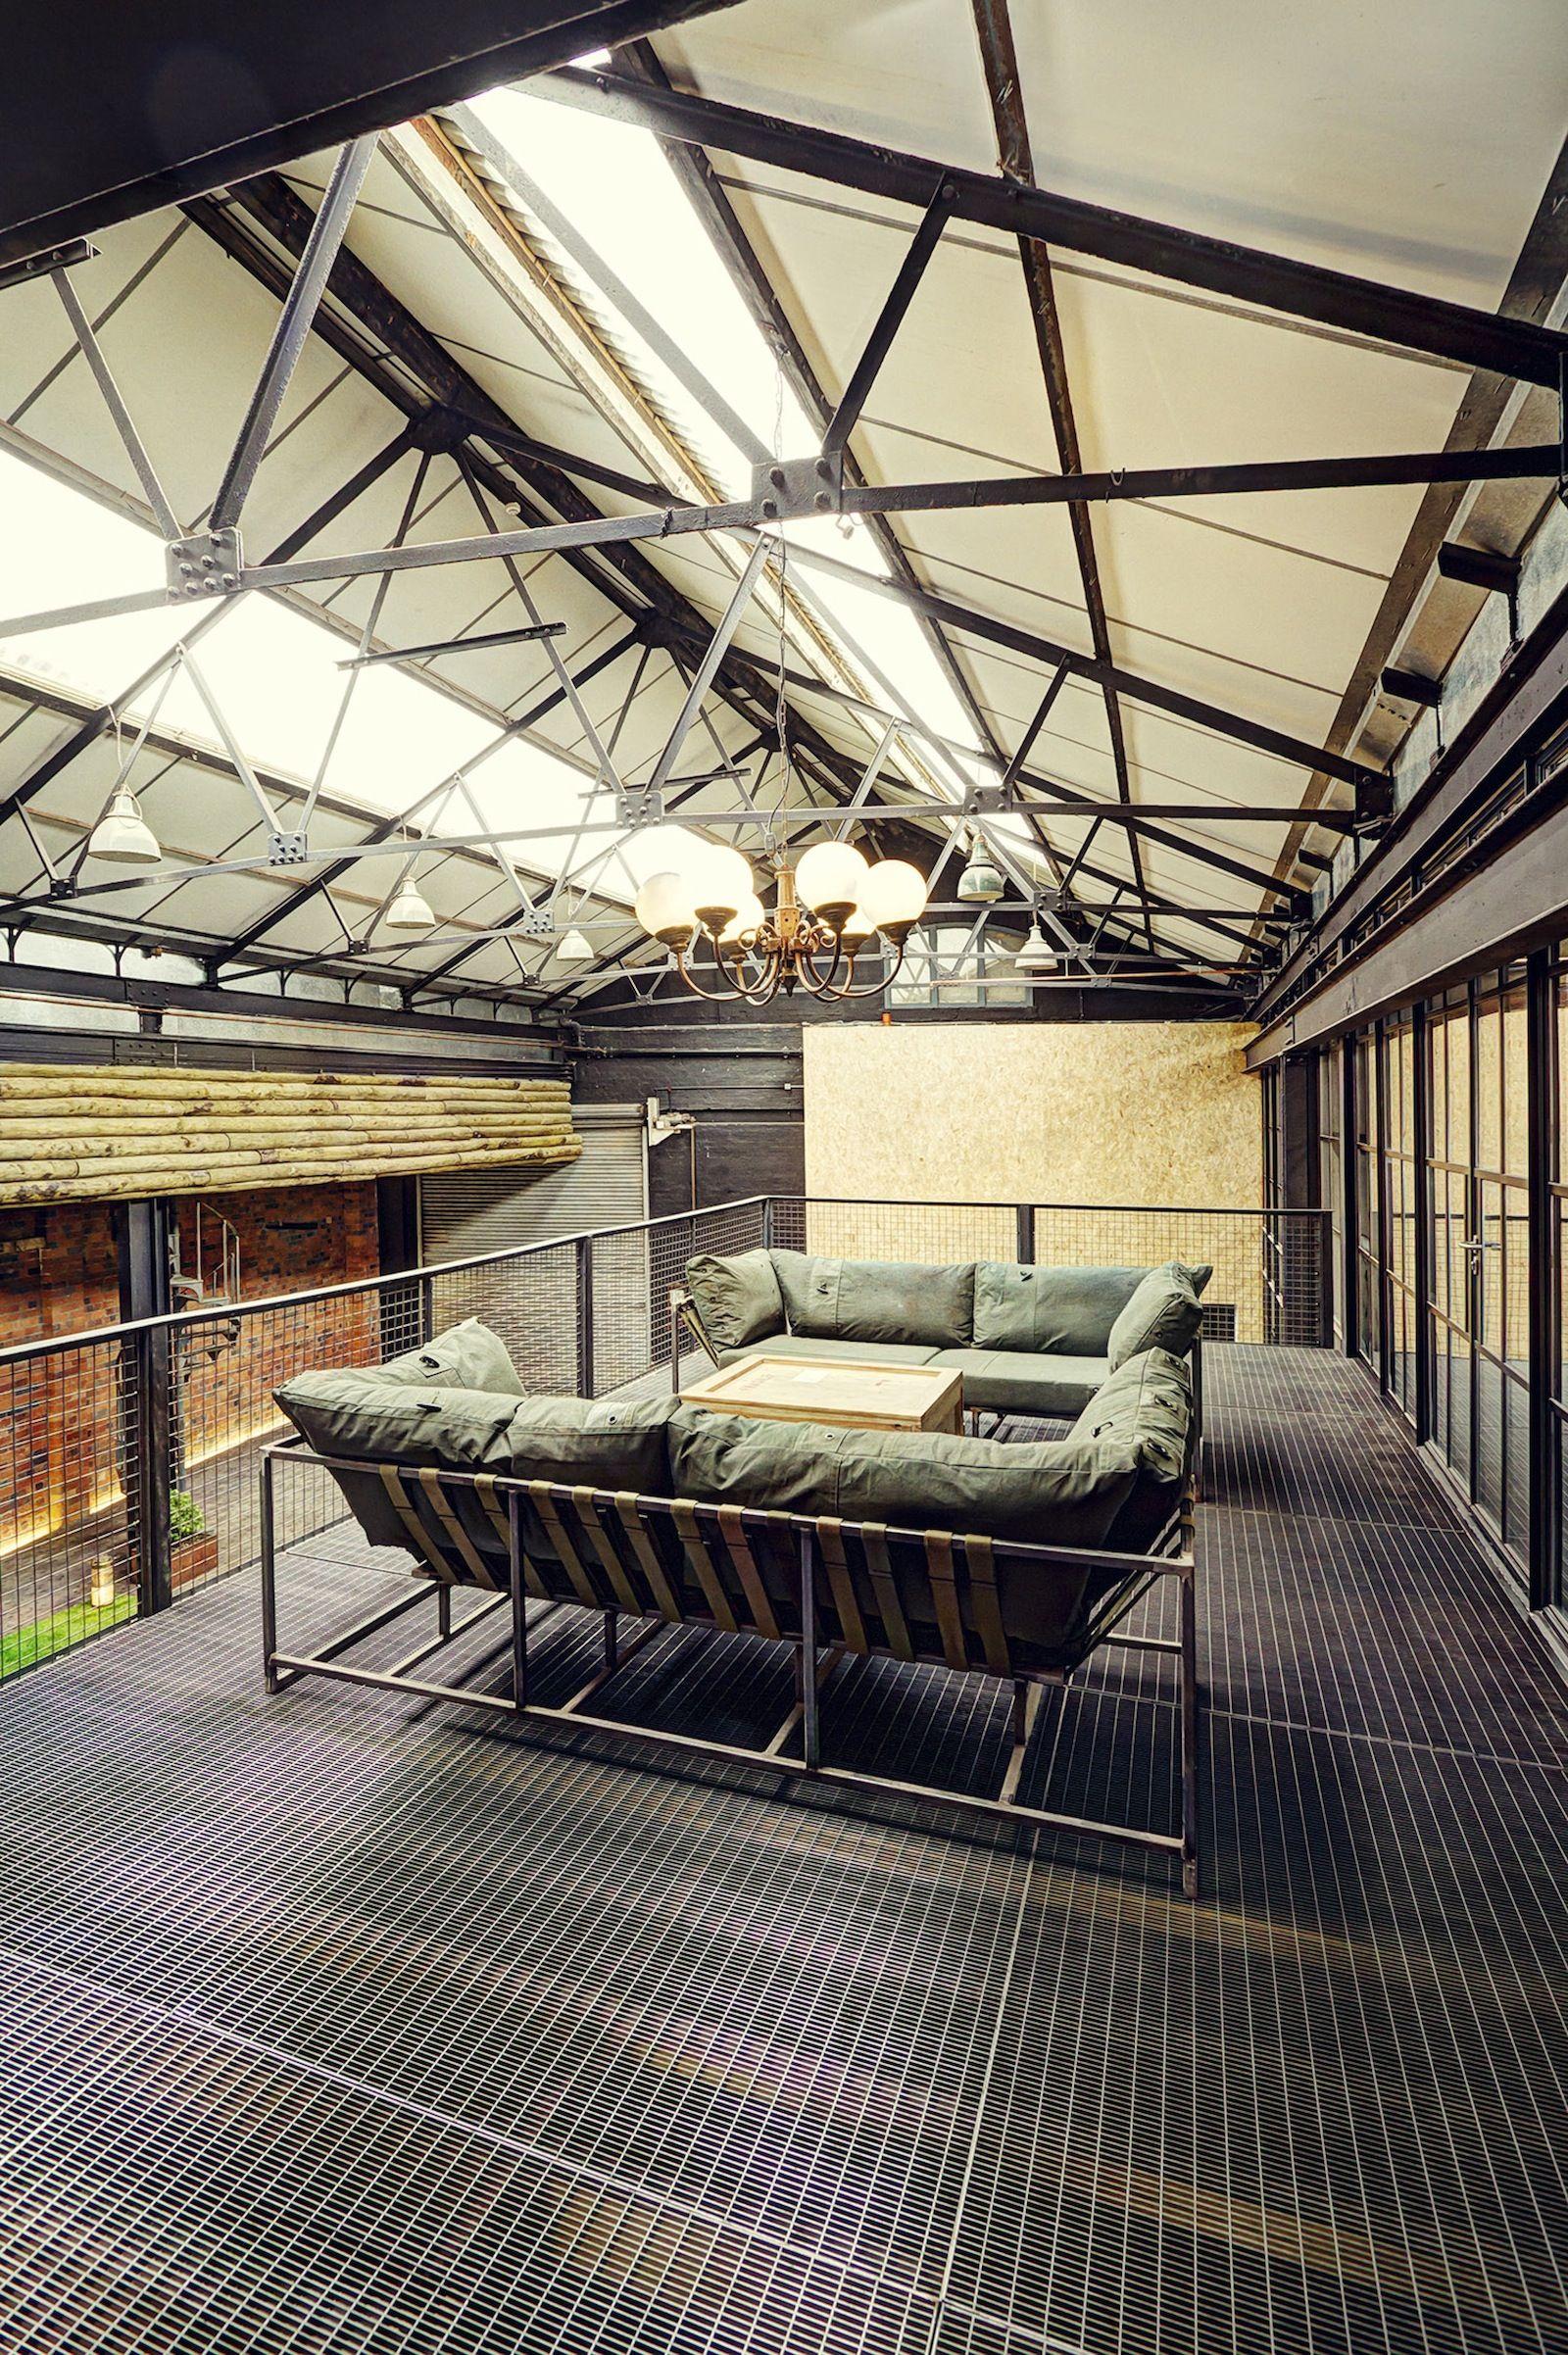 Shootfactory: other uk houses compound birmingham b3 loft